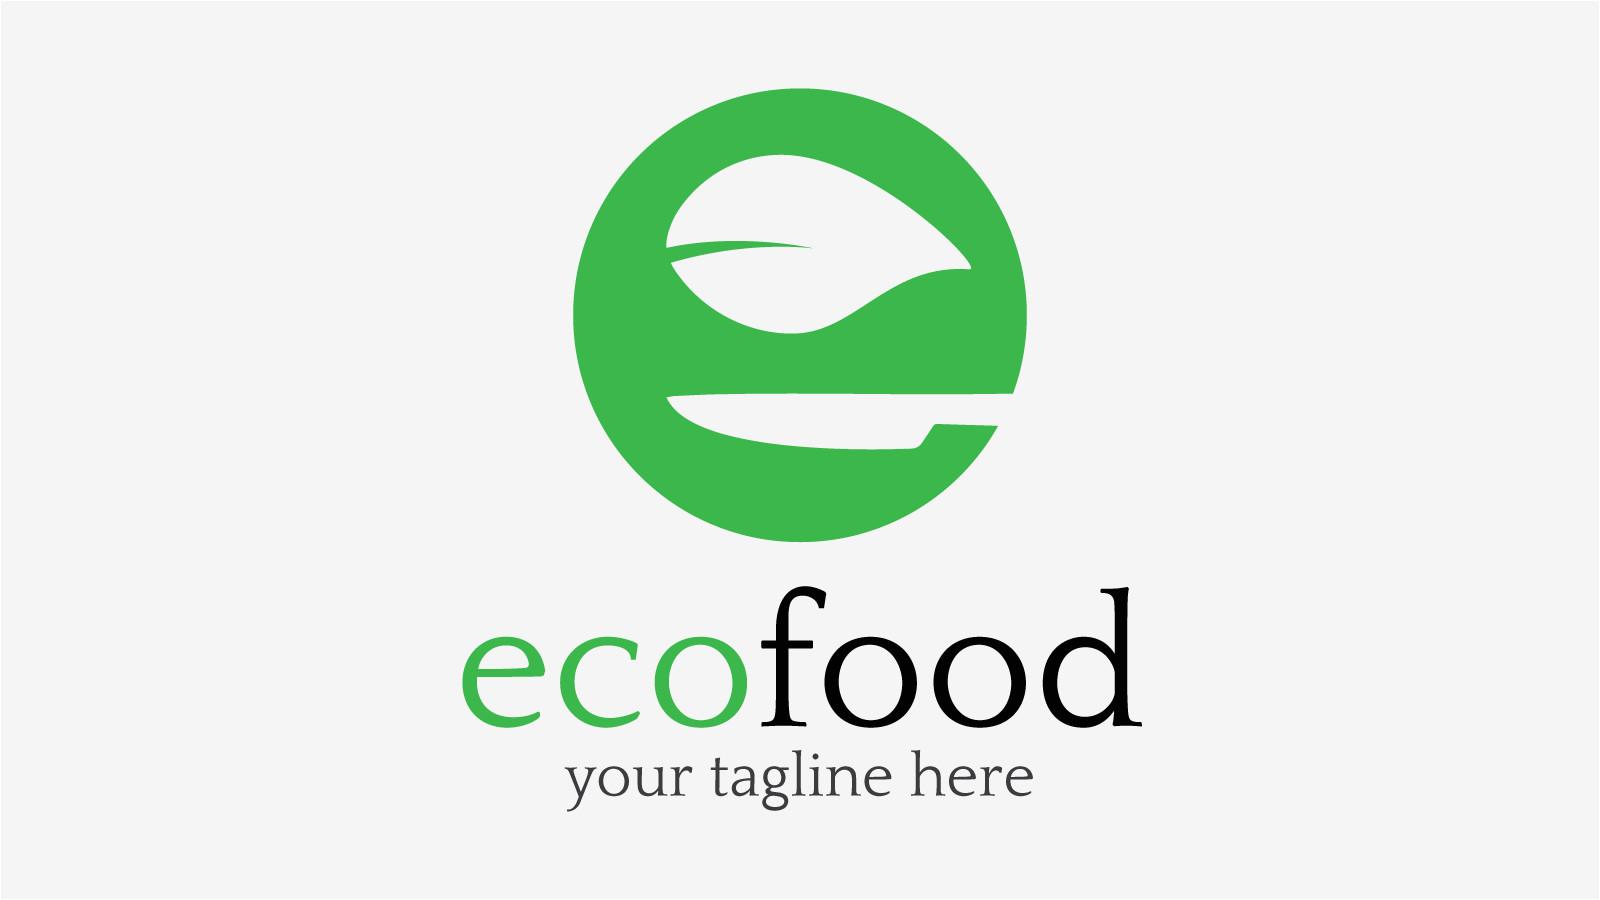 ecofood free logo design